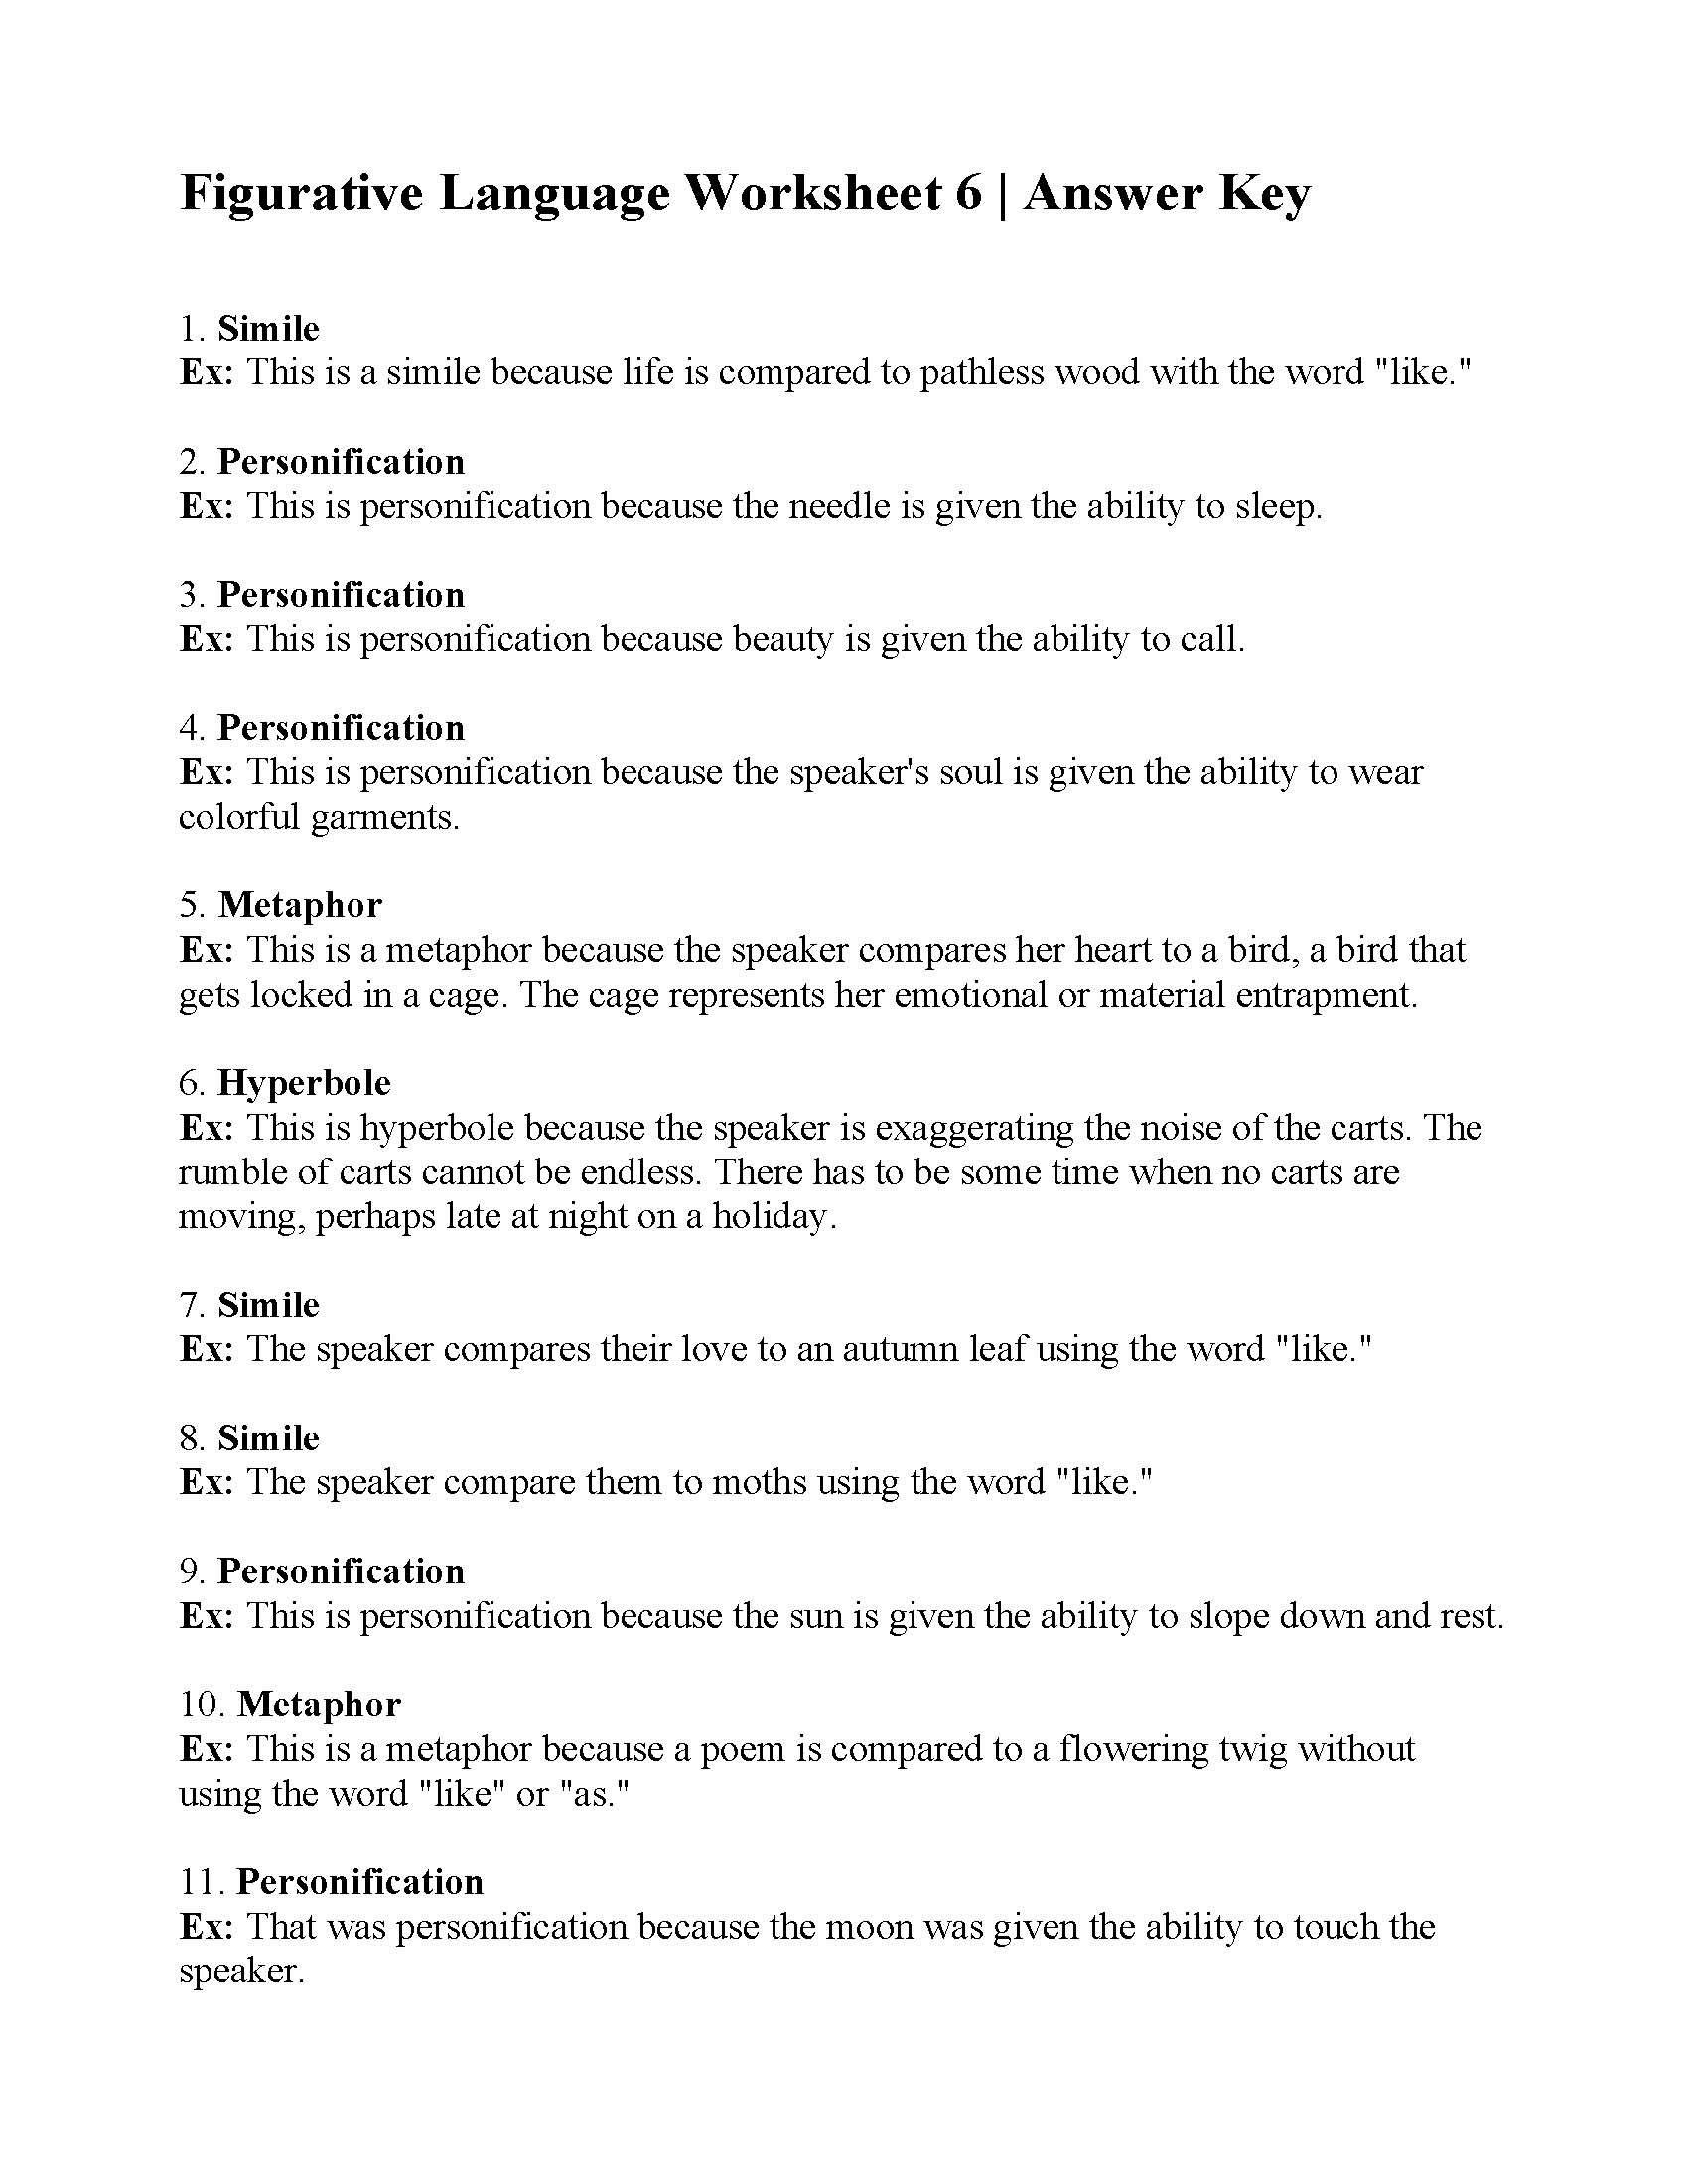 Figurative Language Worksheet 6 Answers Language Worksheets Figurative Language Worksheet Figurative Language Review [ 2200 x 1700 Pixel ]